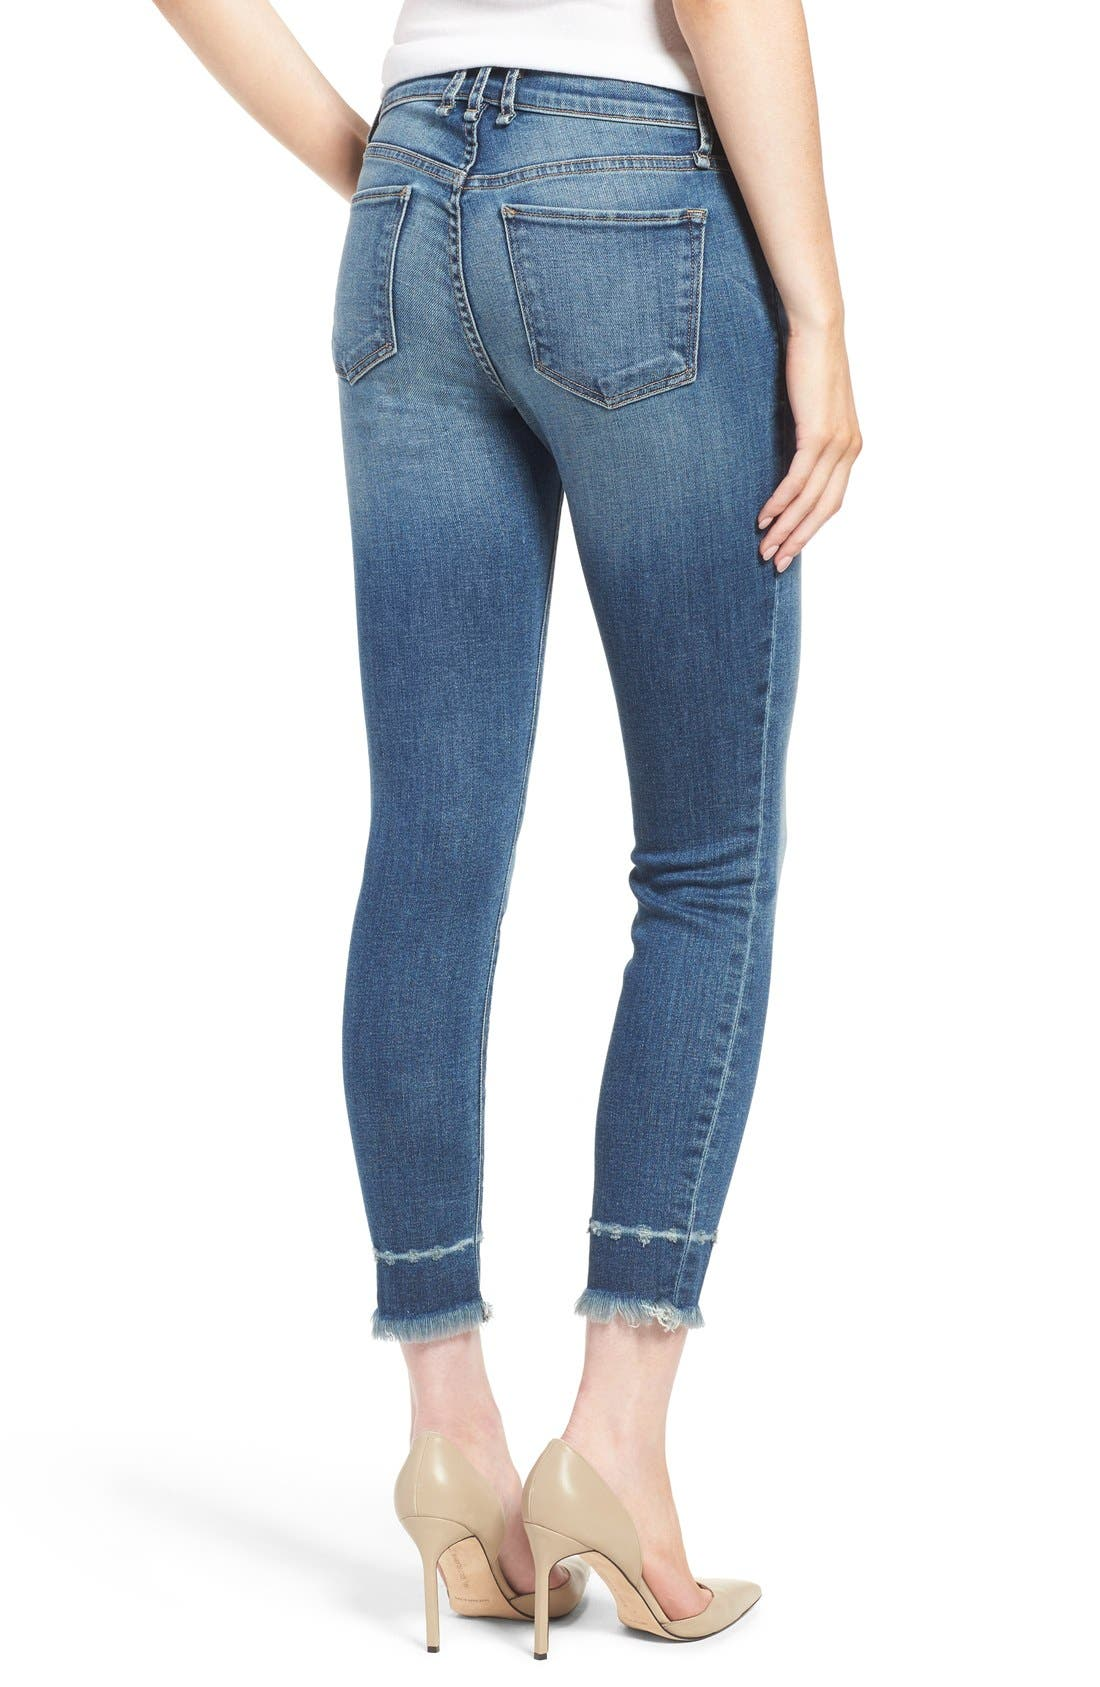 Alternate Image 2  - McGuire 'Newton' Released Hem Crop Skinny Jeans (Iona)